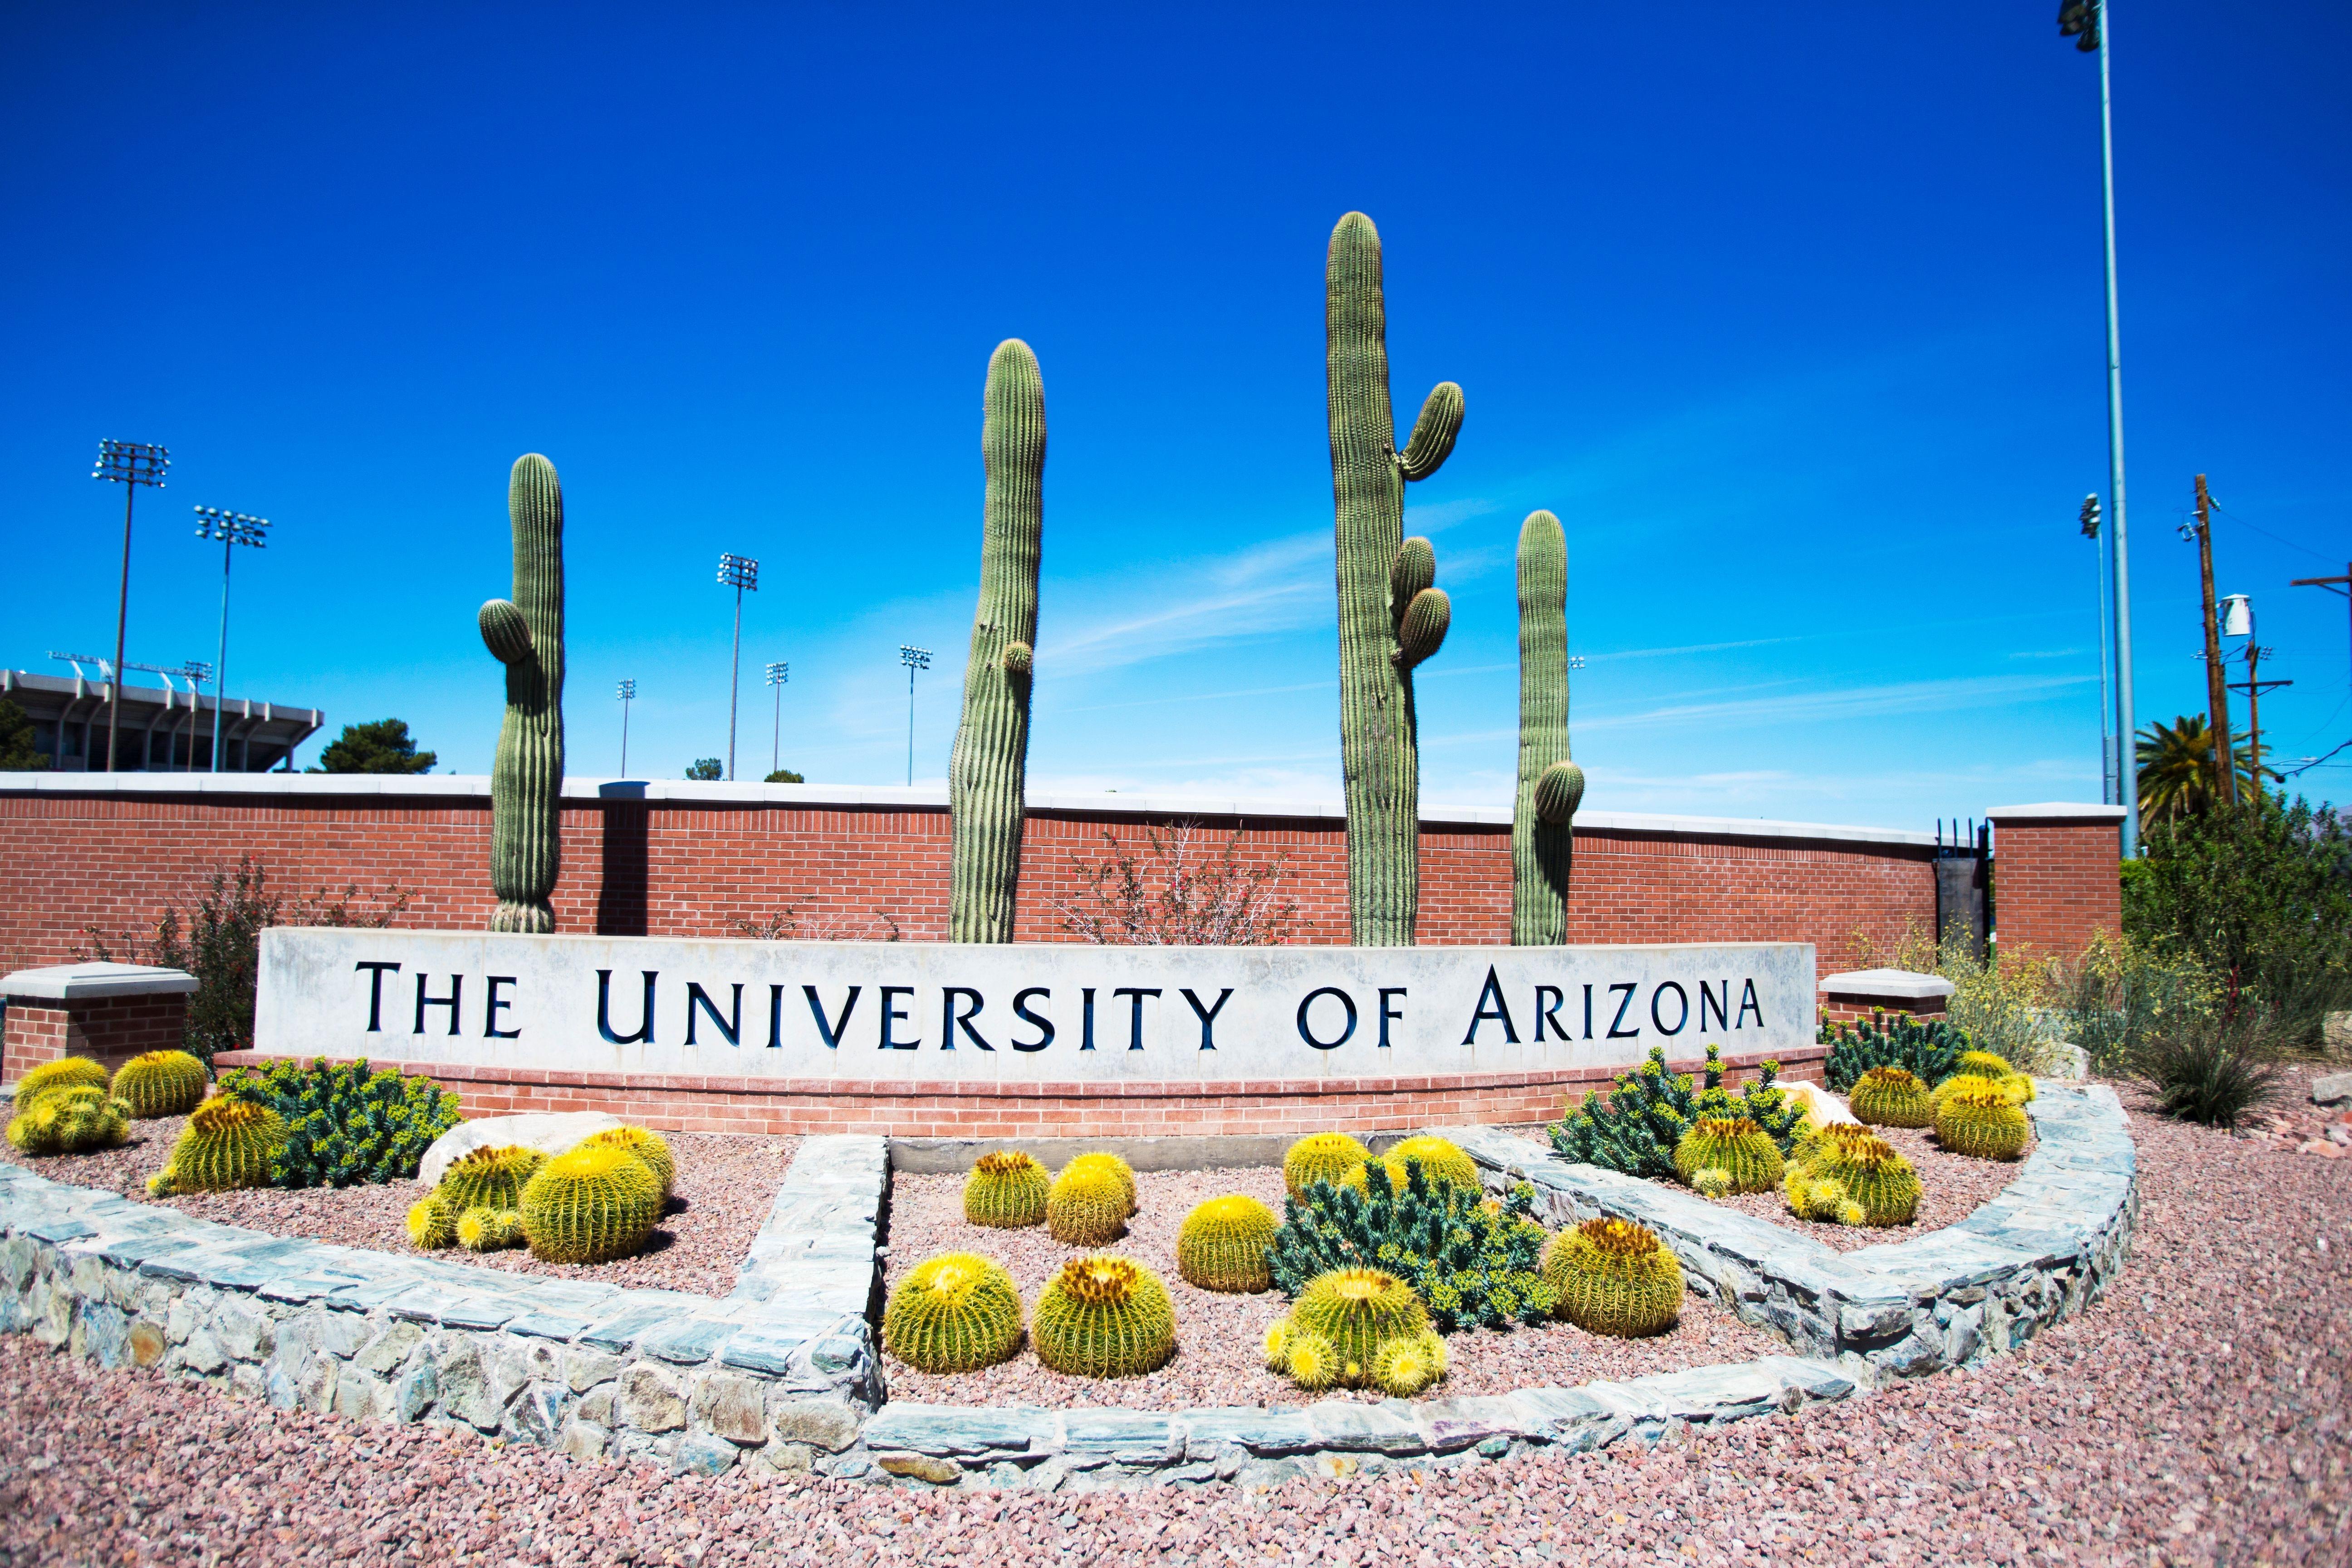 University of Arizona is following the 3 Ts...